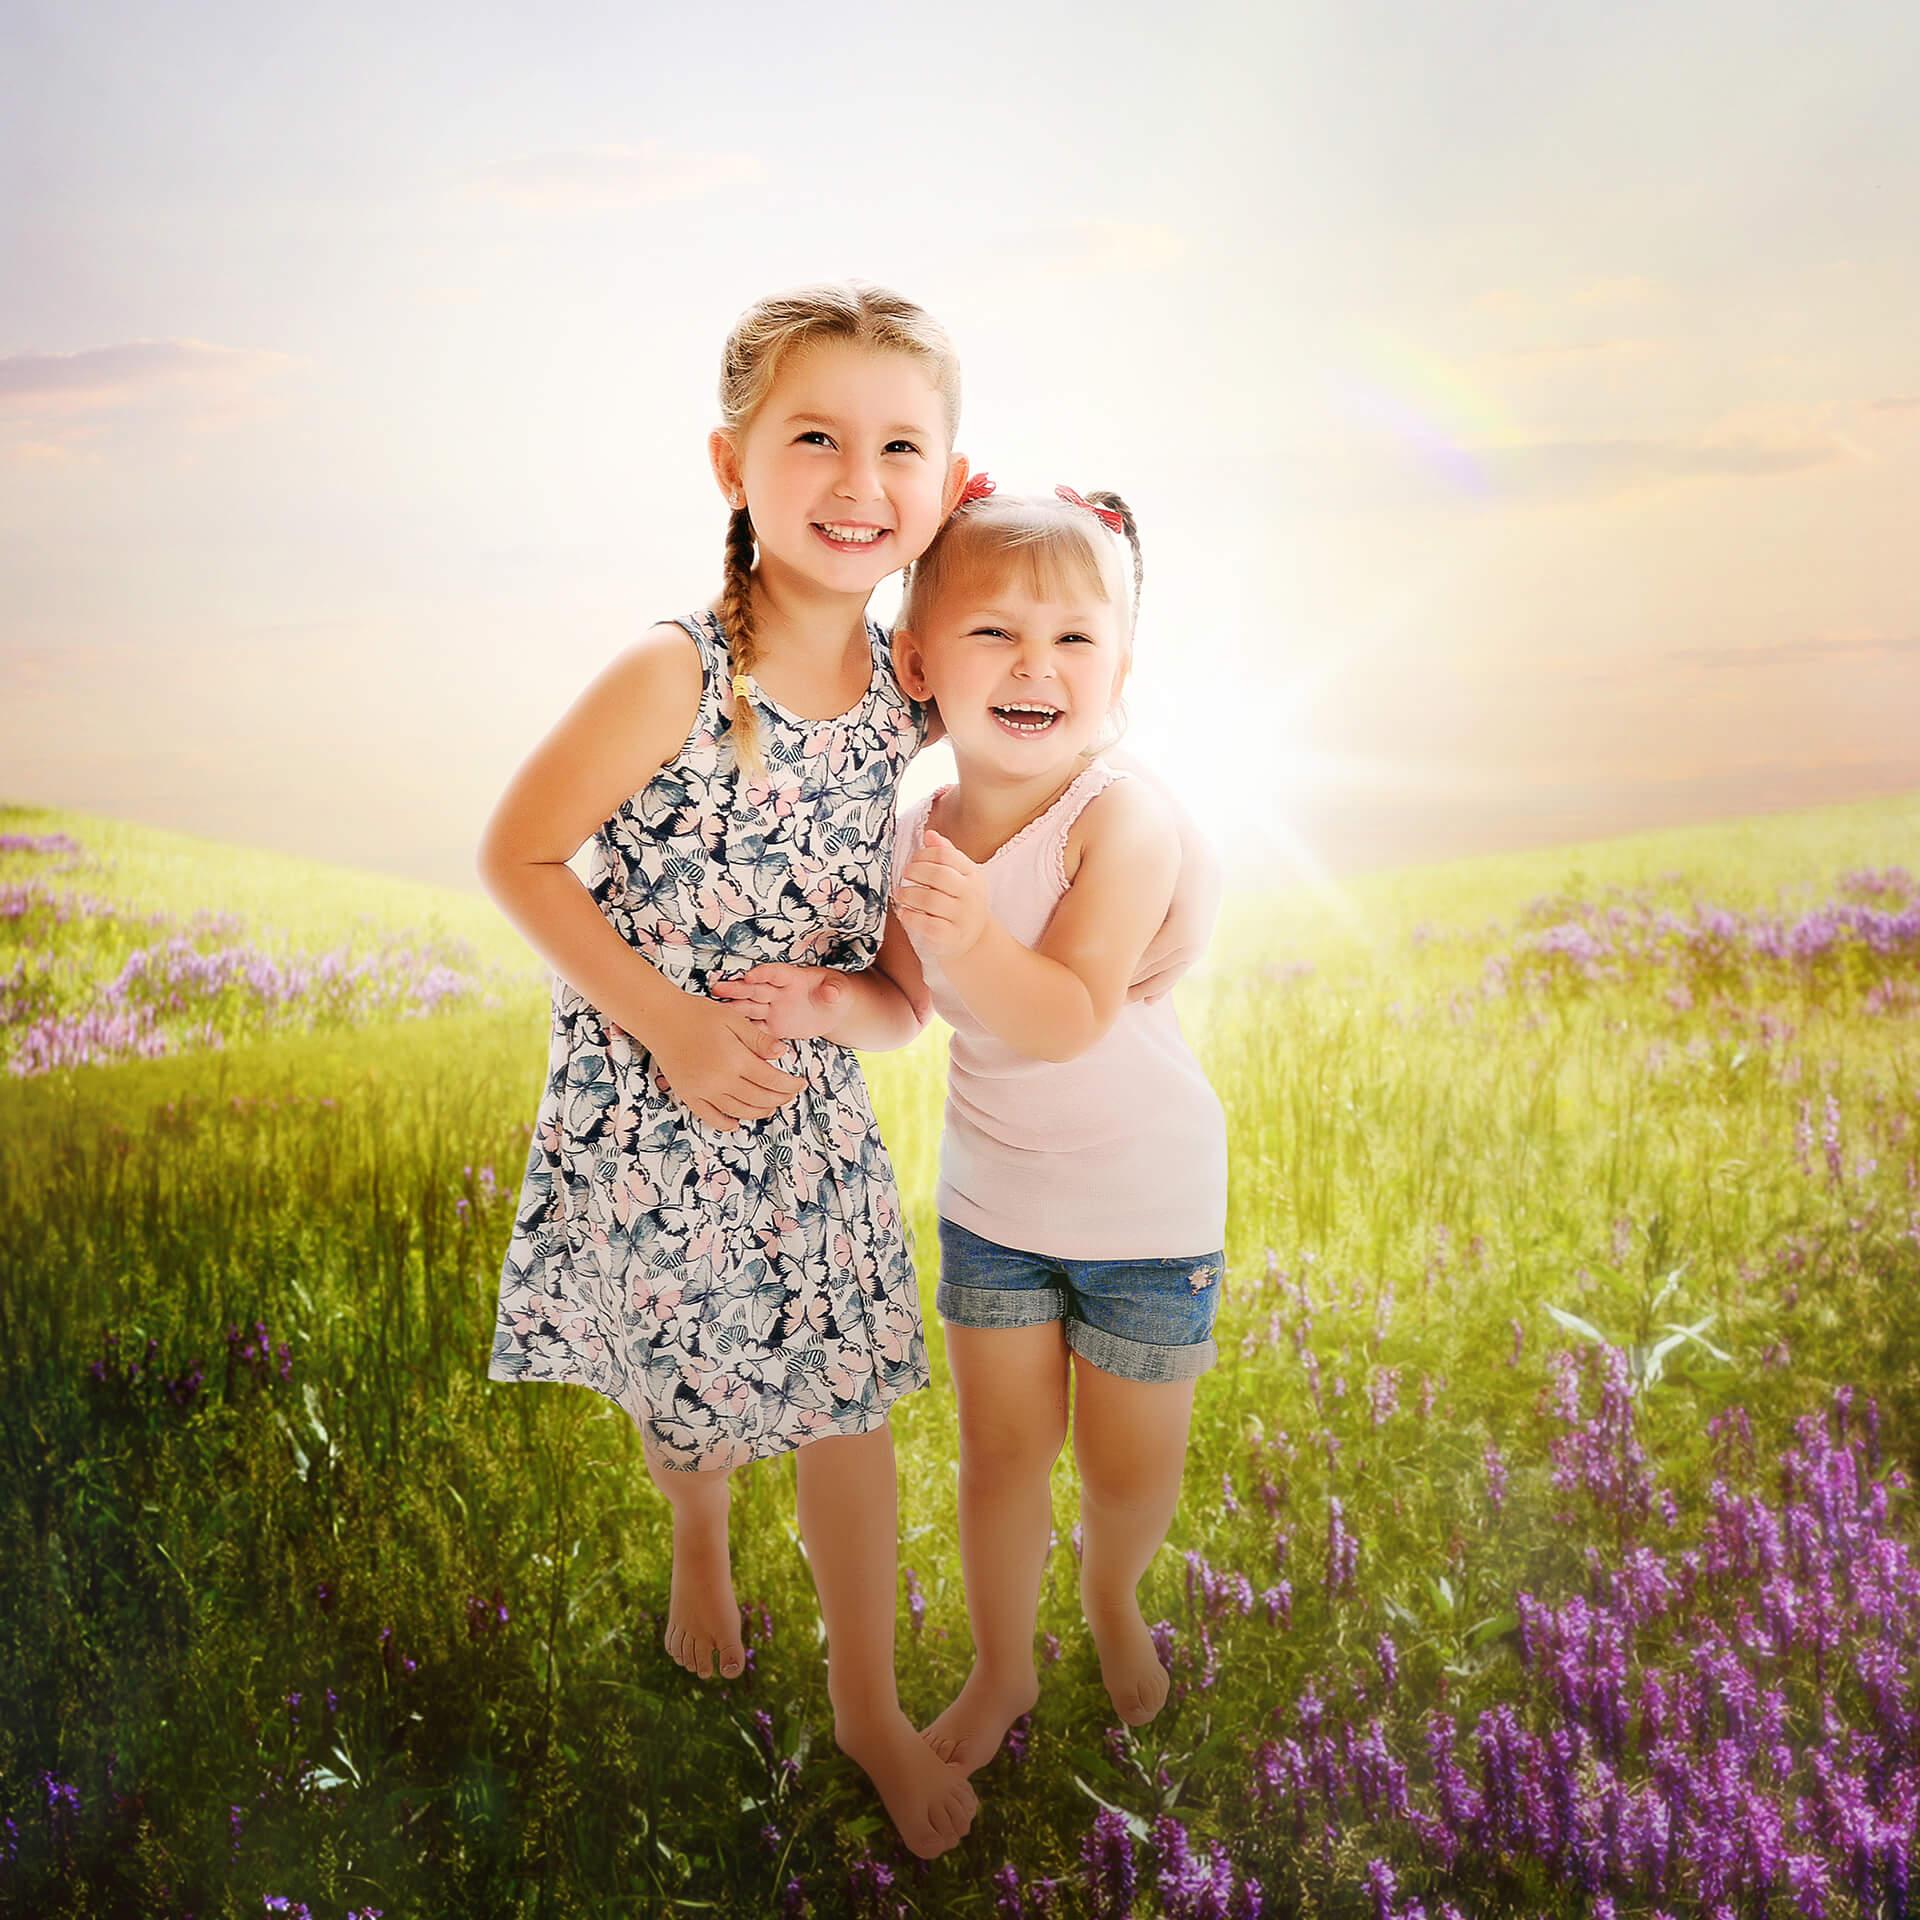 kids photoshoot horthampton kline studios